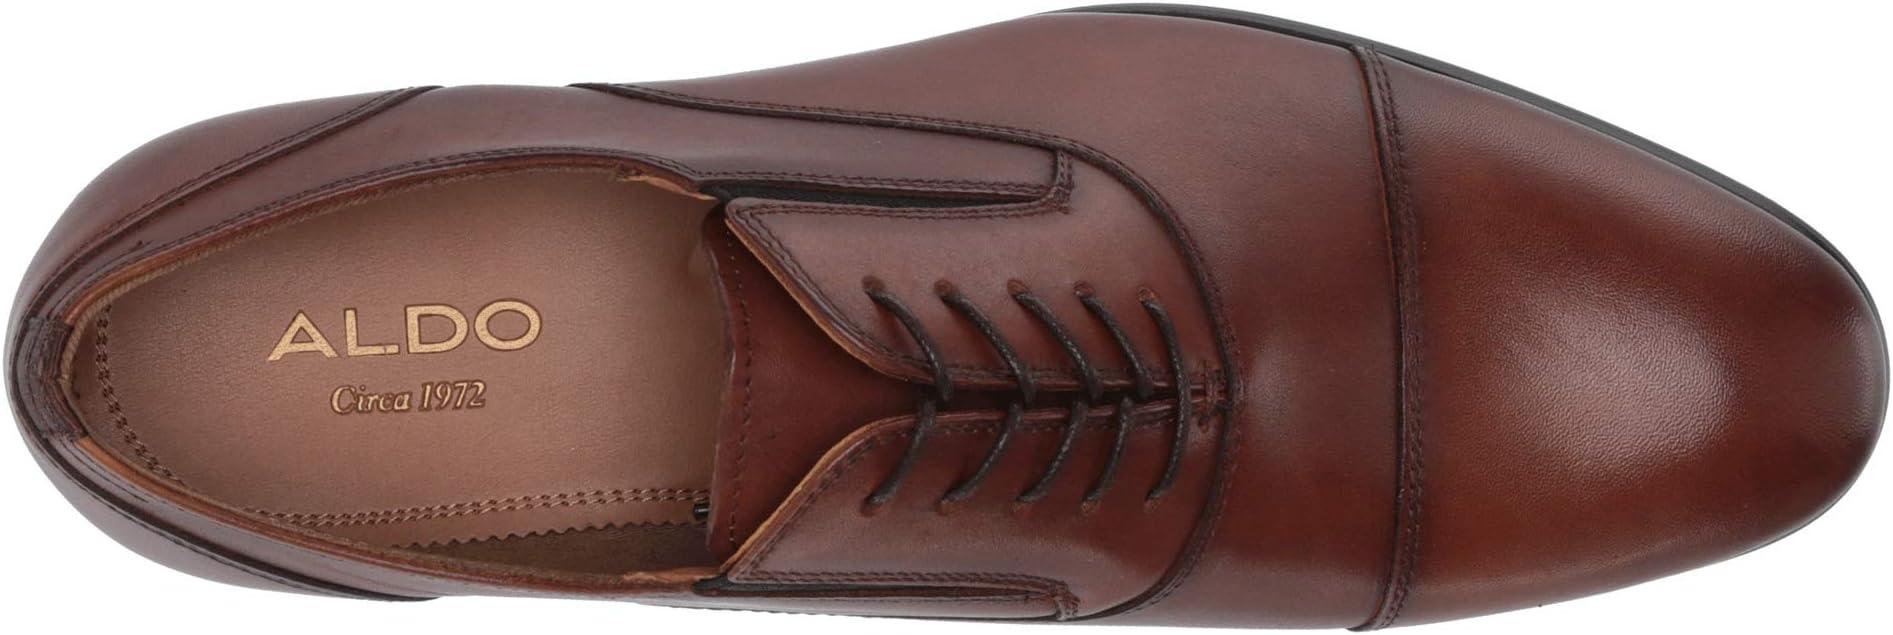 ALDO Yirang | Men's shoes | 2020 Newest